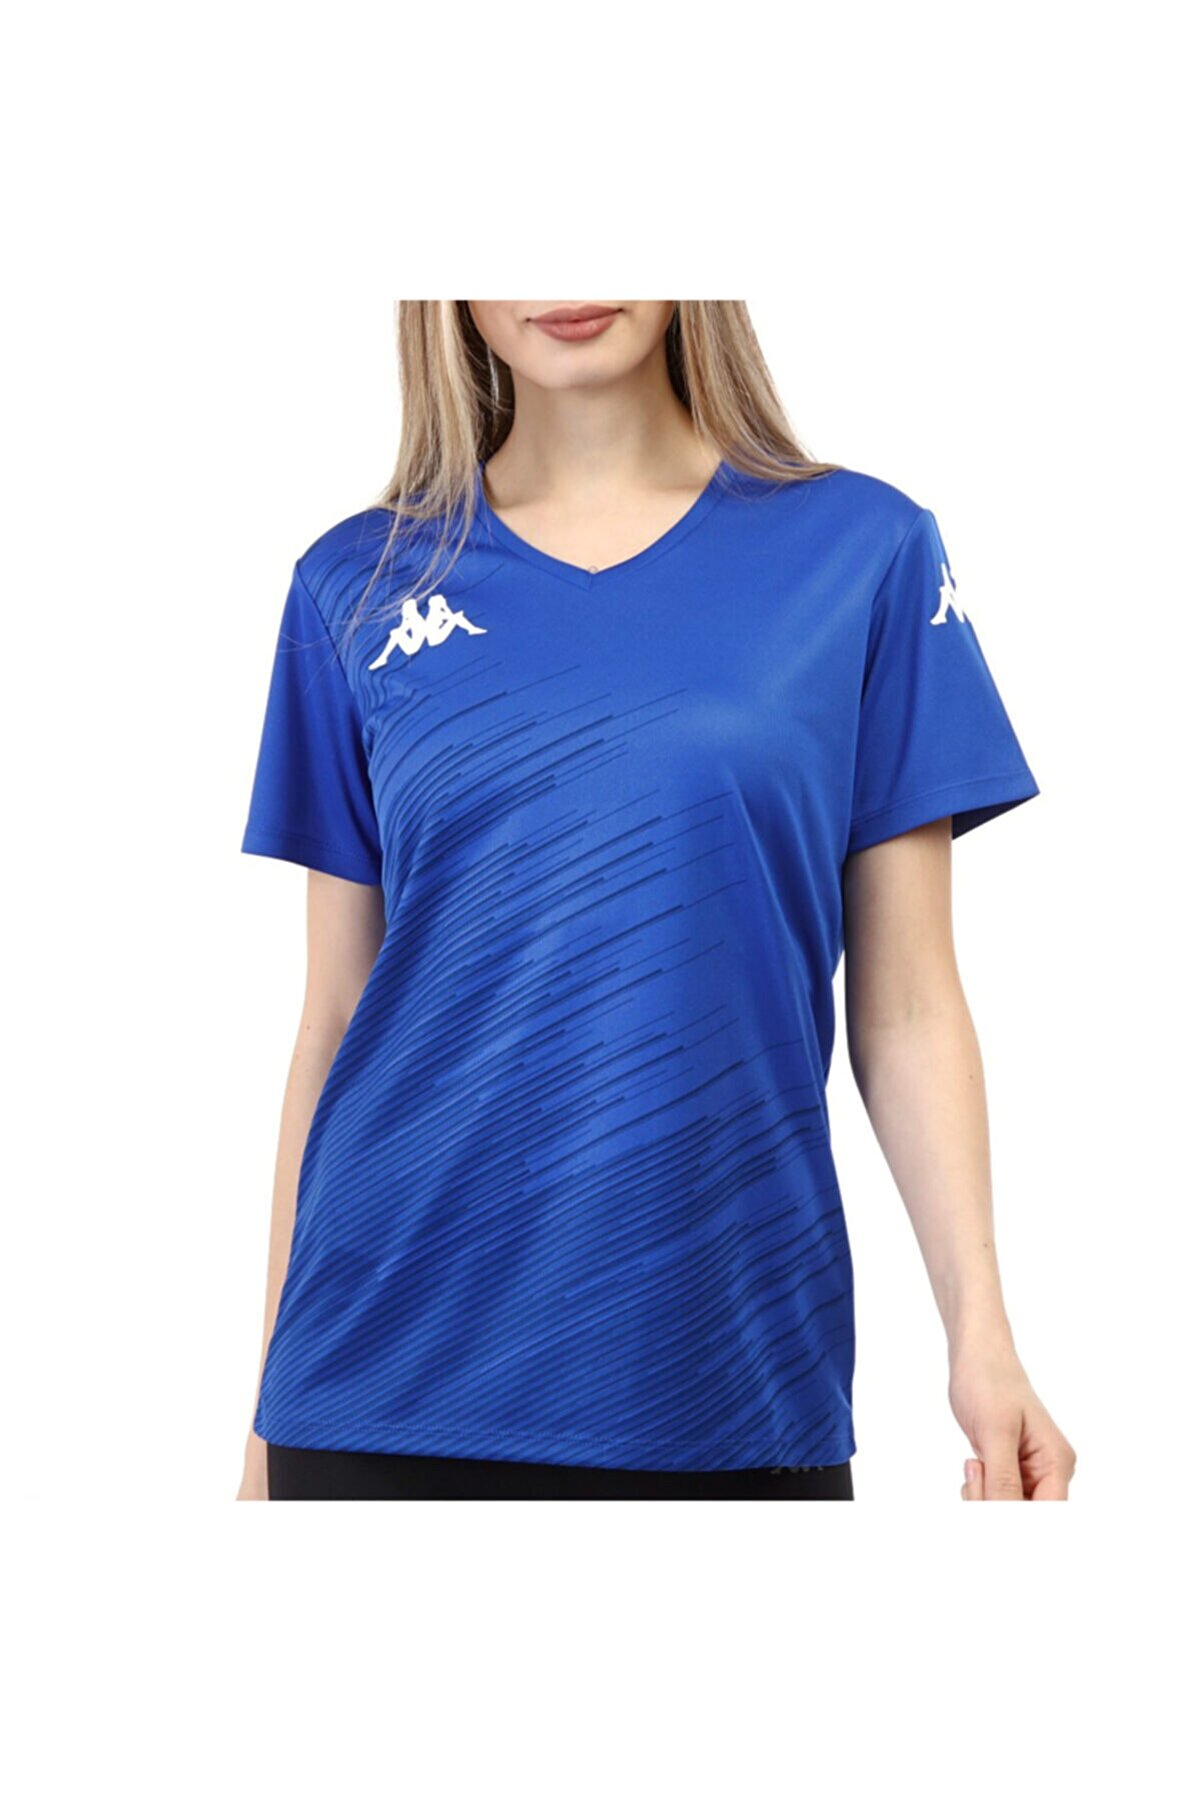 Kappa Kadın Saks Abuw Poly T-shirt